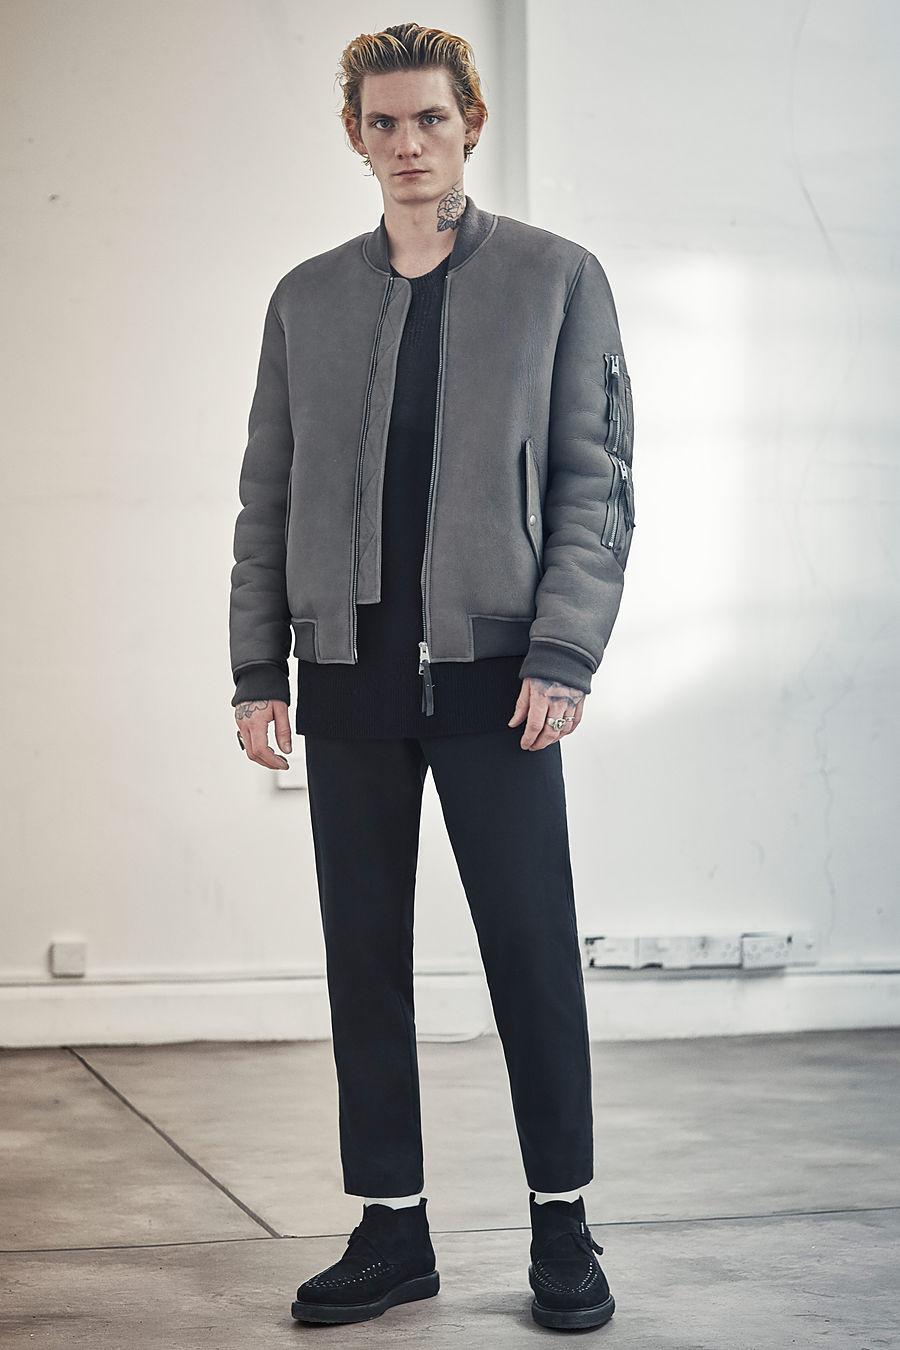 Rogan shearling bomber jacket, £598 Pico trouser, £128 Bower Boot, £158